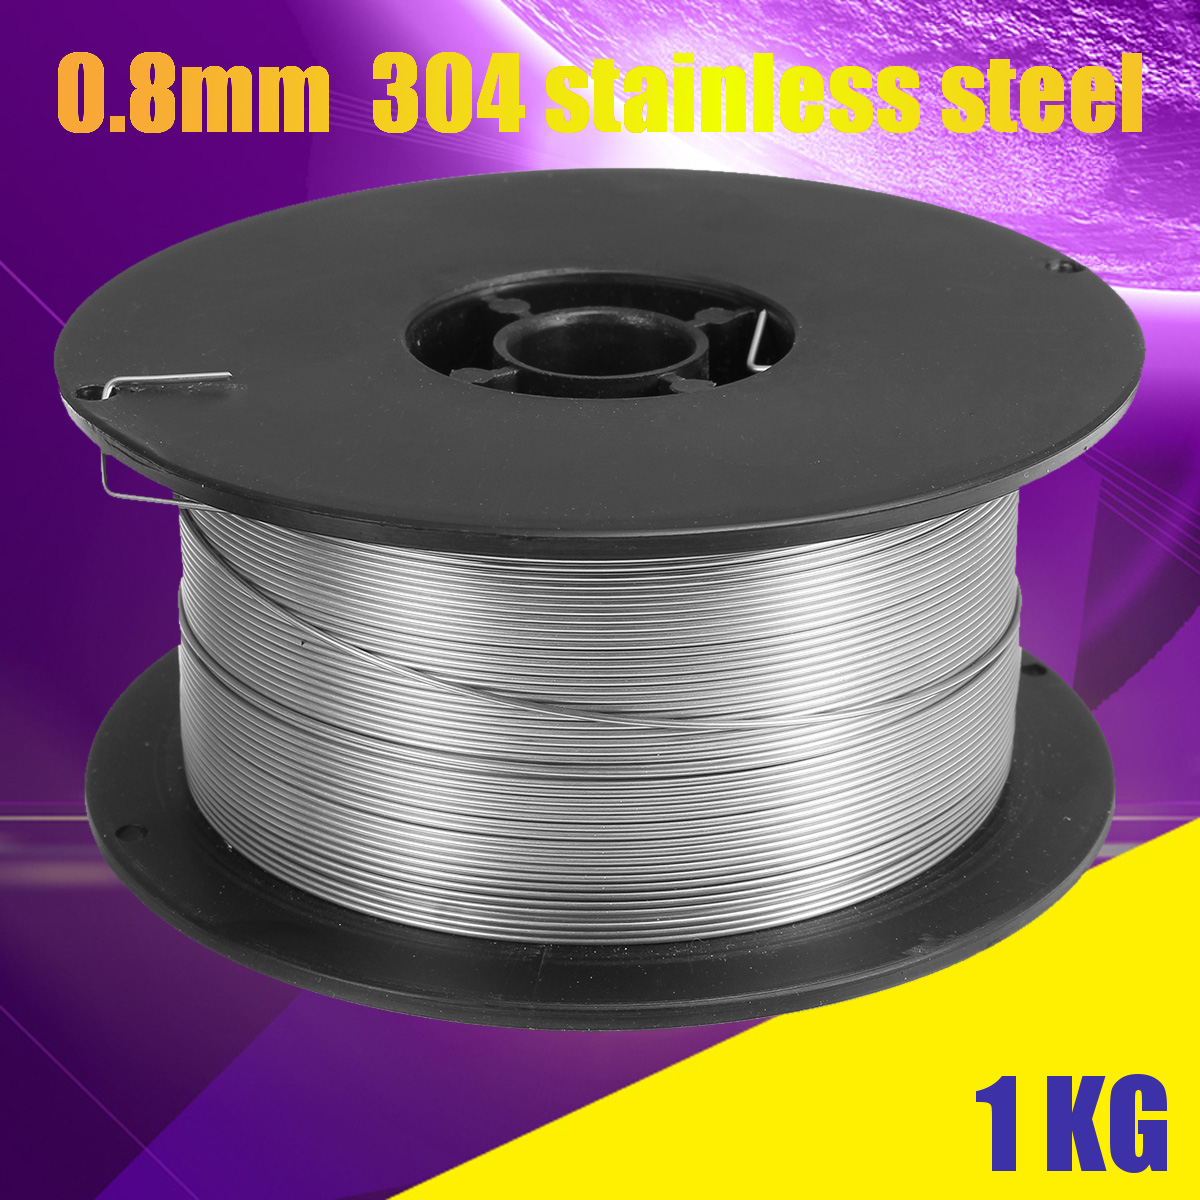 Gasless Flux Cored Mig Welding Wire 0.8 x 1KG Roll